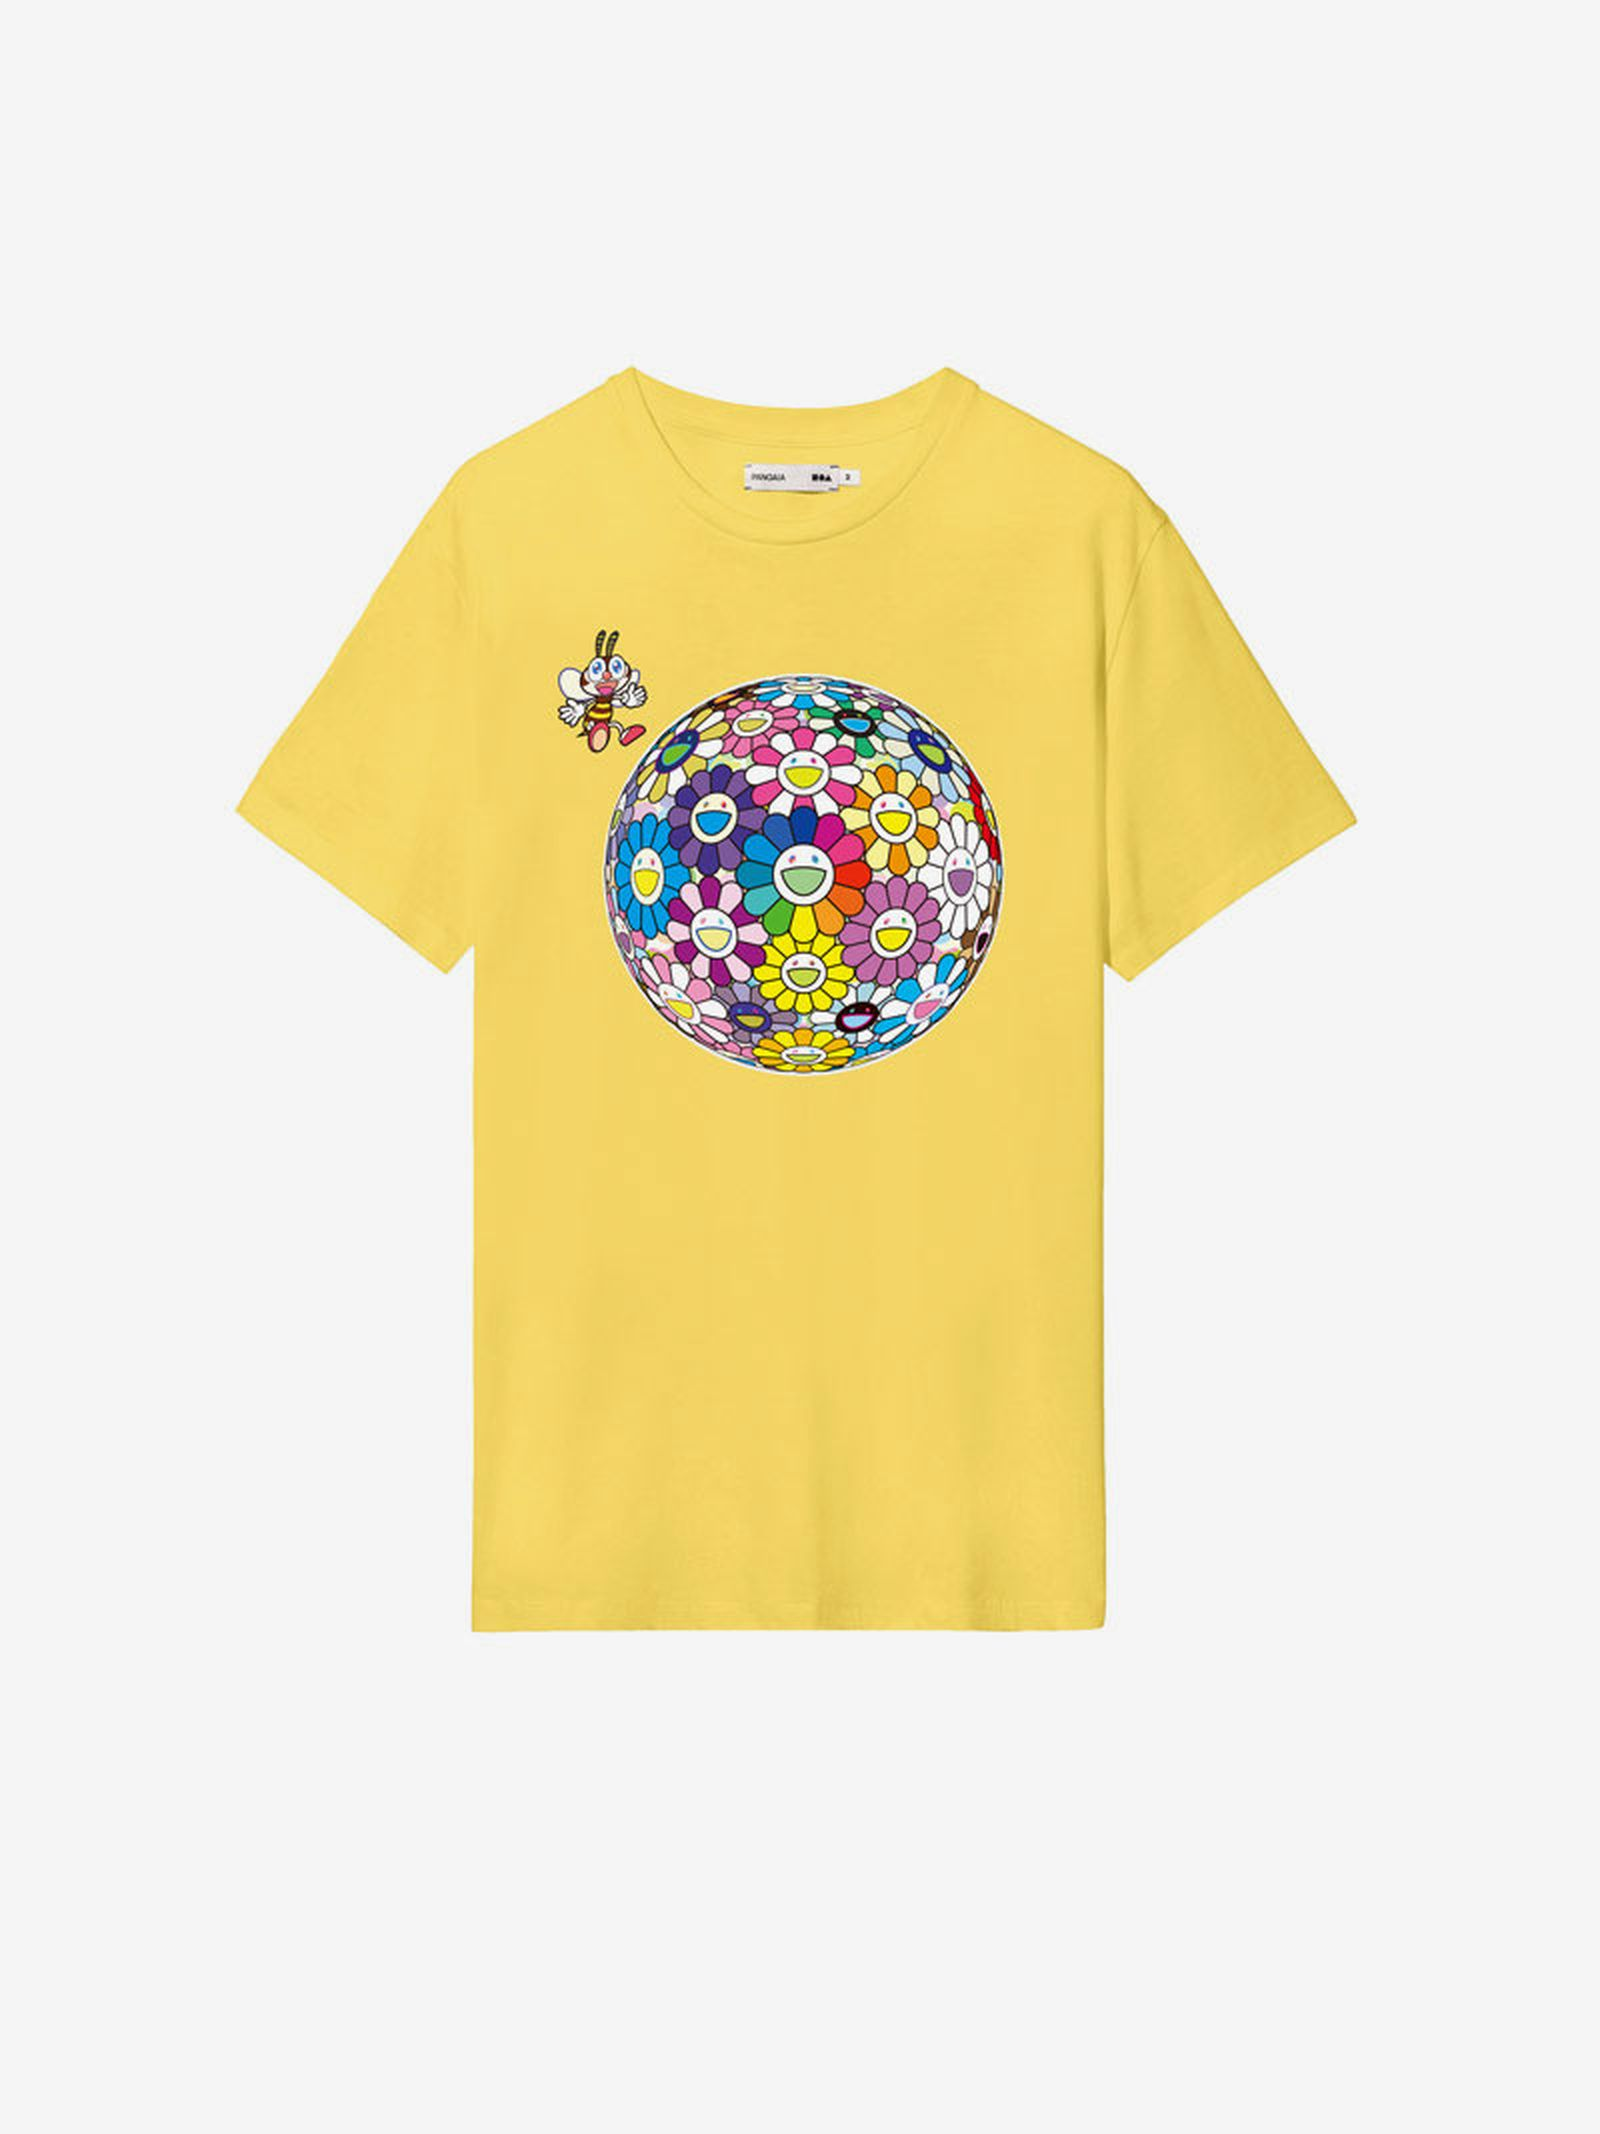 Takashi-Saffron-Yellow-Front-edit